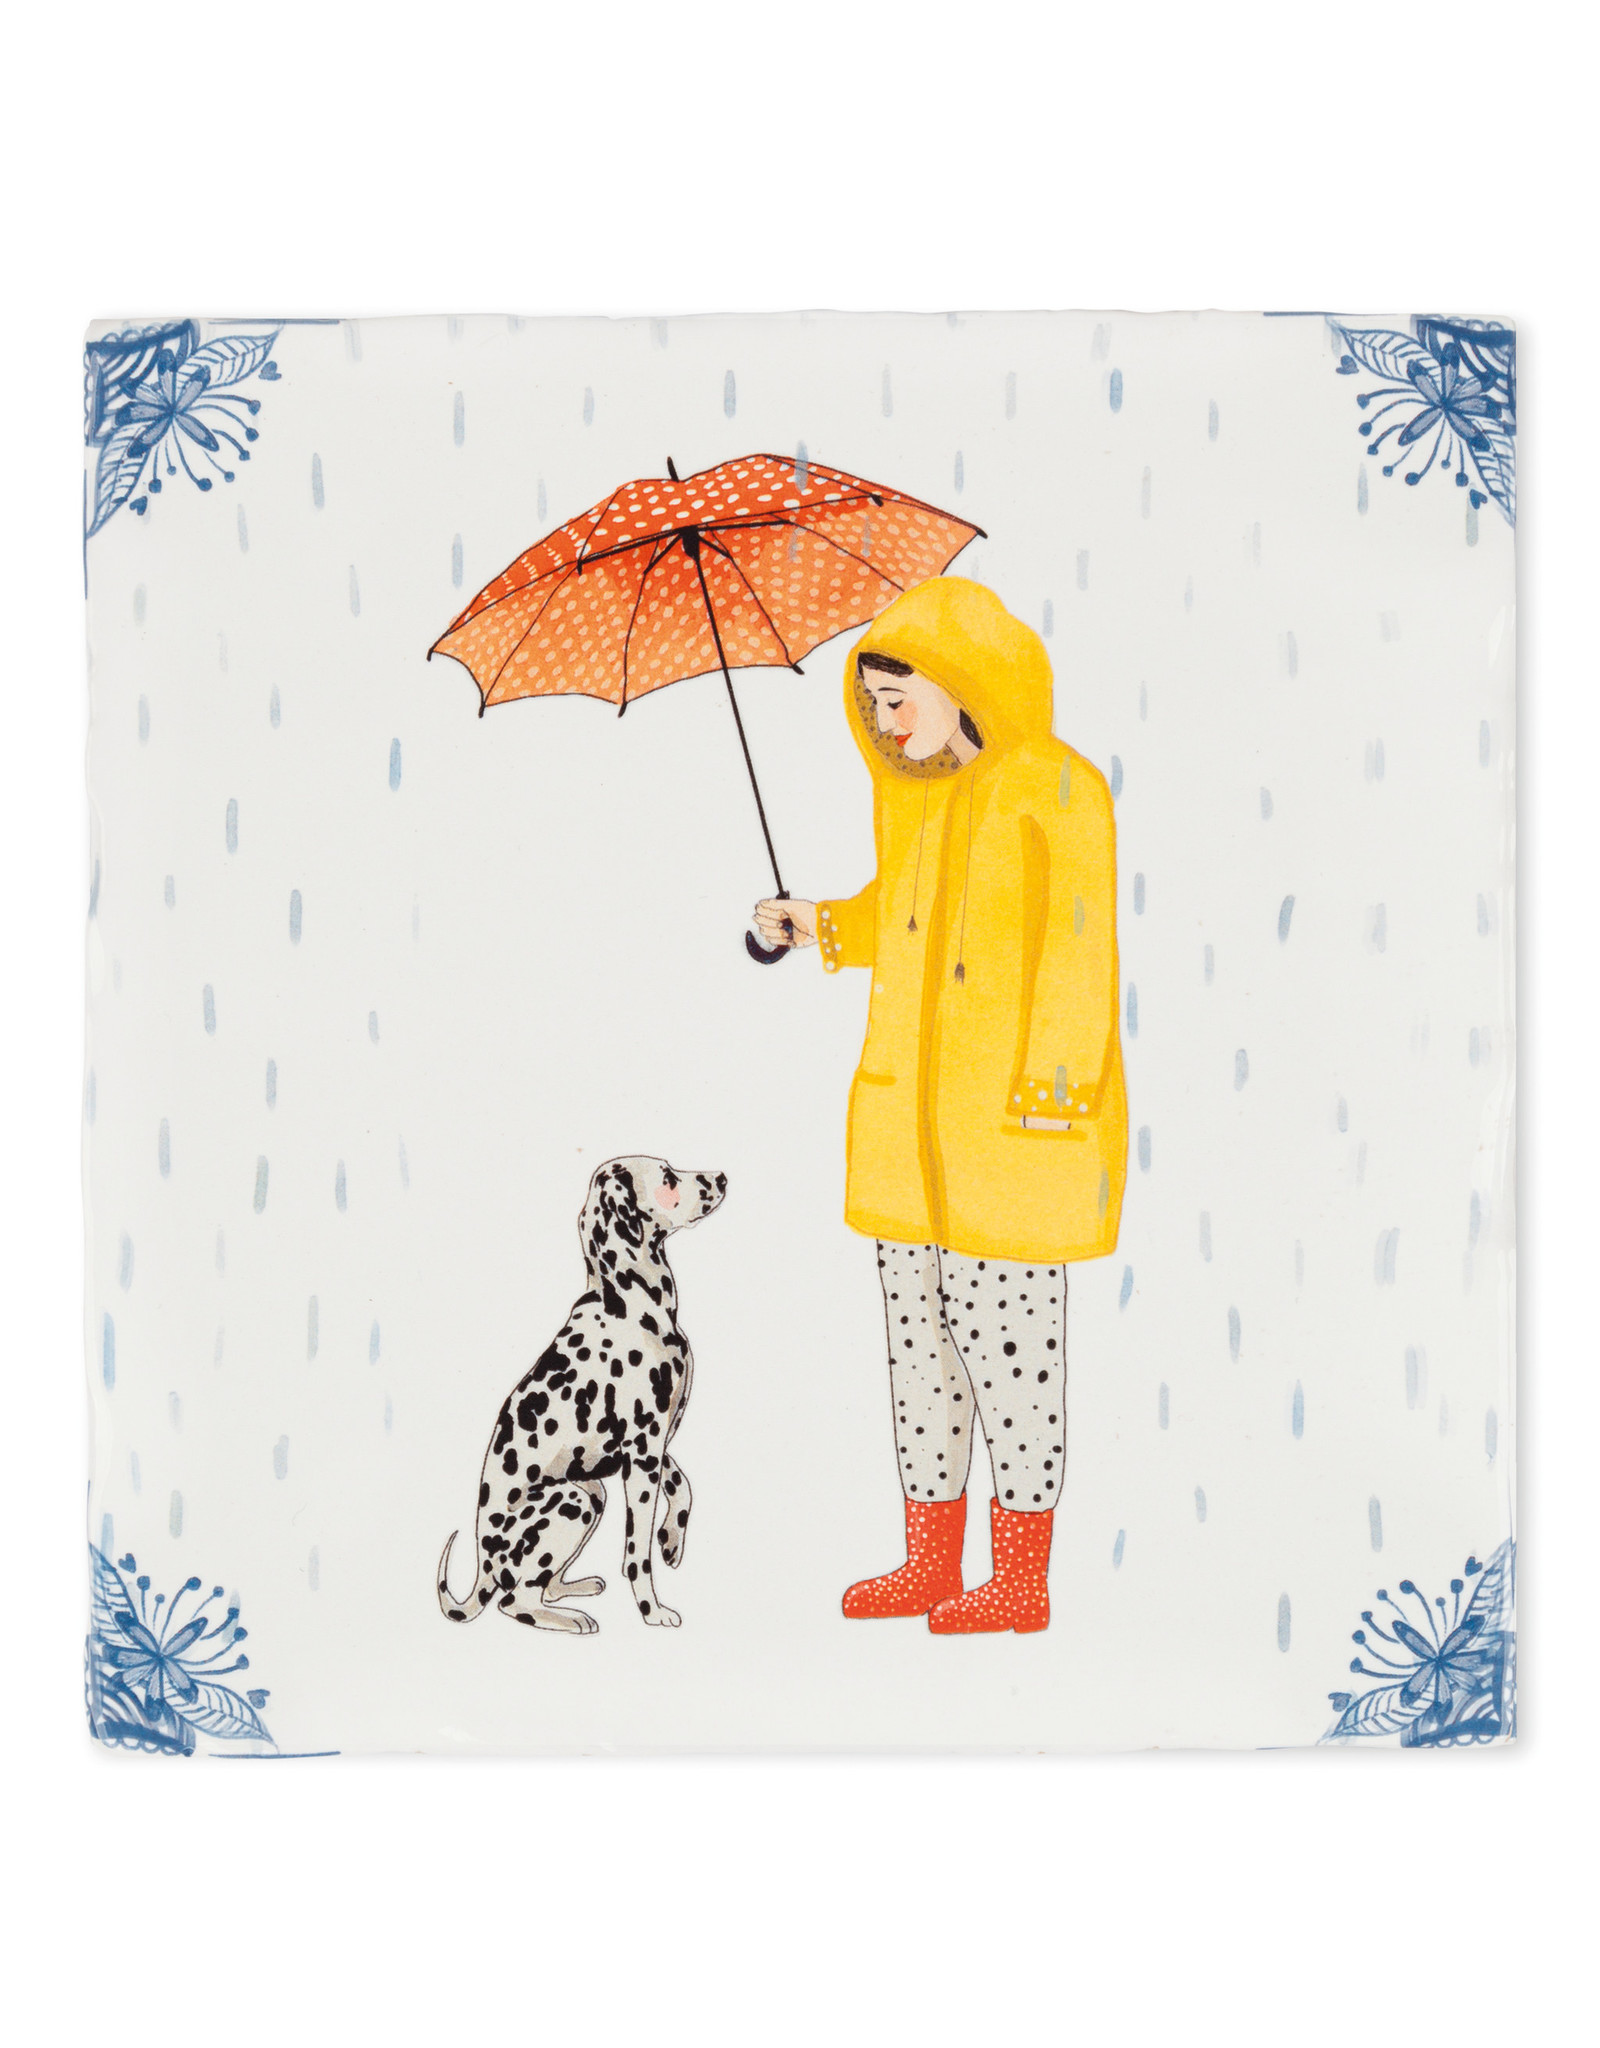 Storytiles It's raining dogs